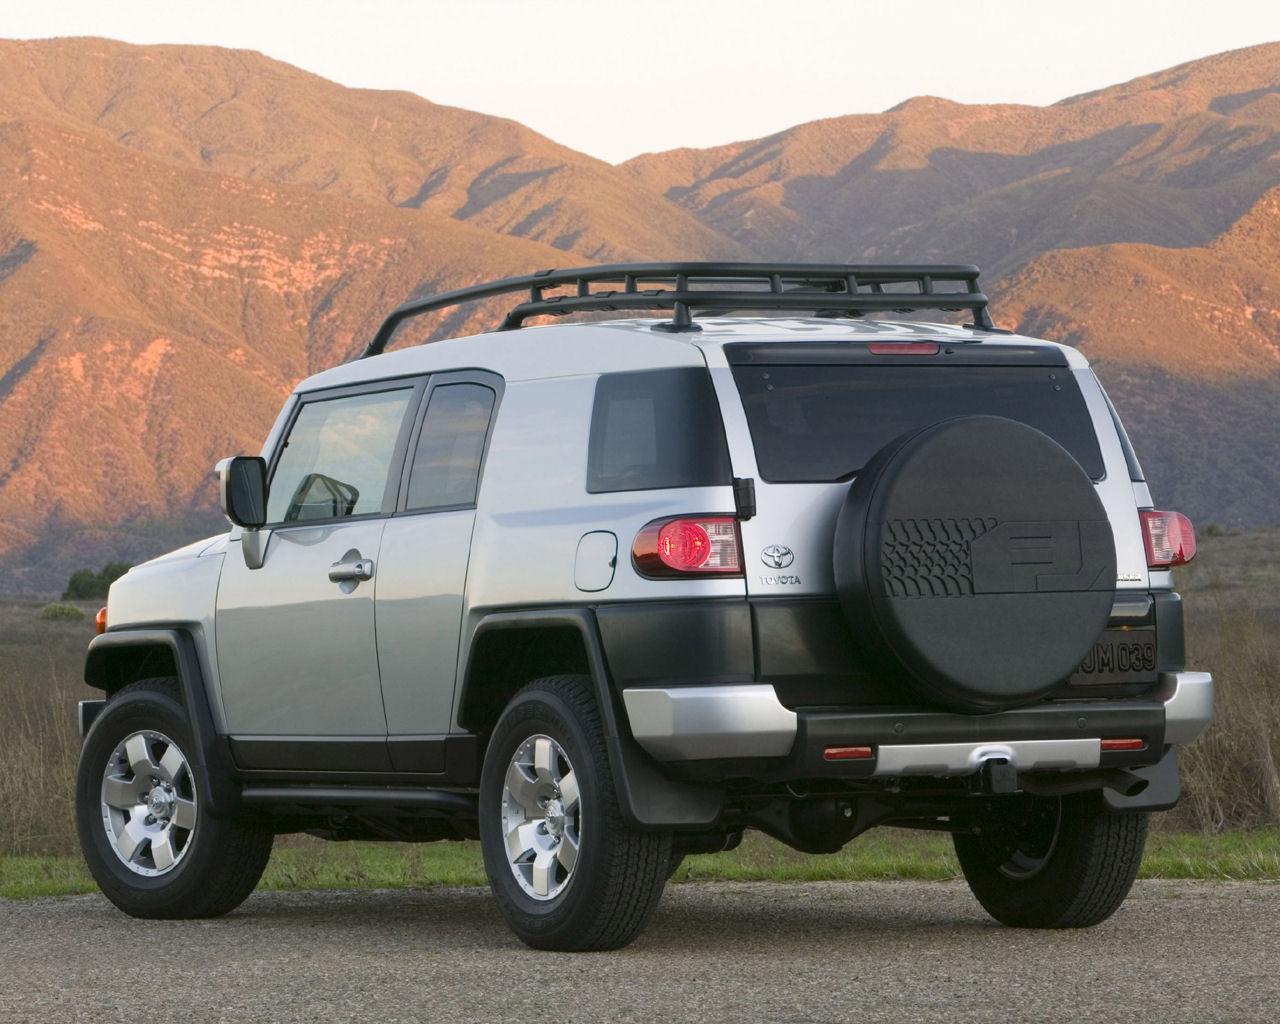 Toyota FJ Cruiser V6 AWD   1280x1024 Wallpaper 1280x1024